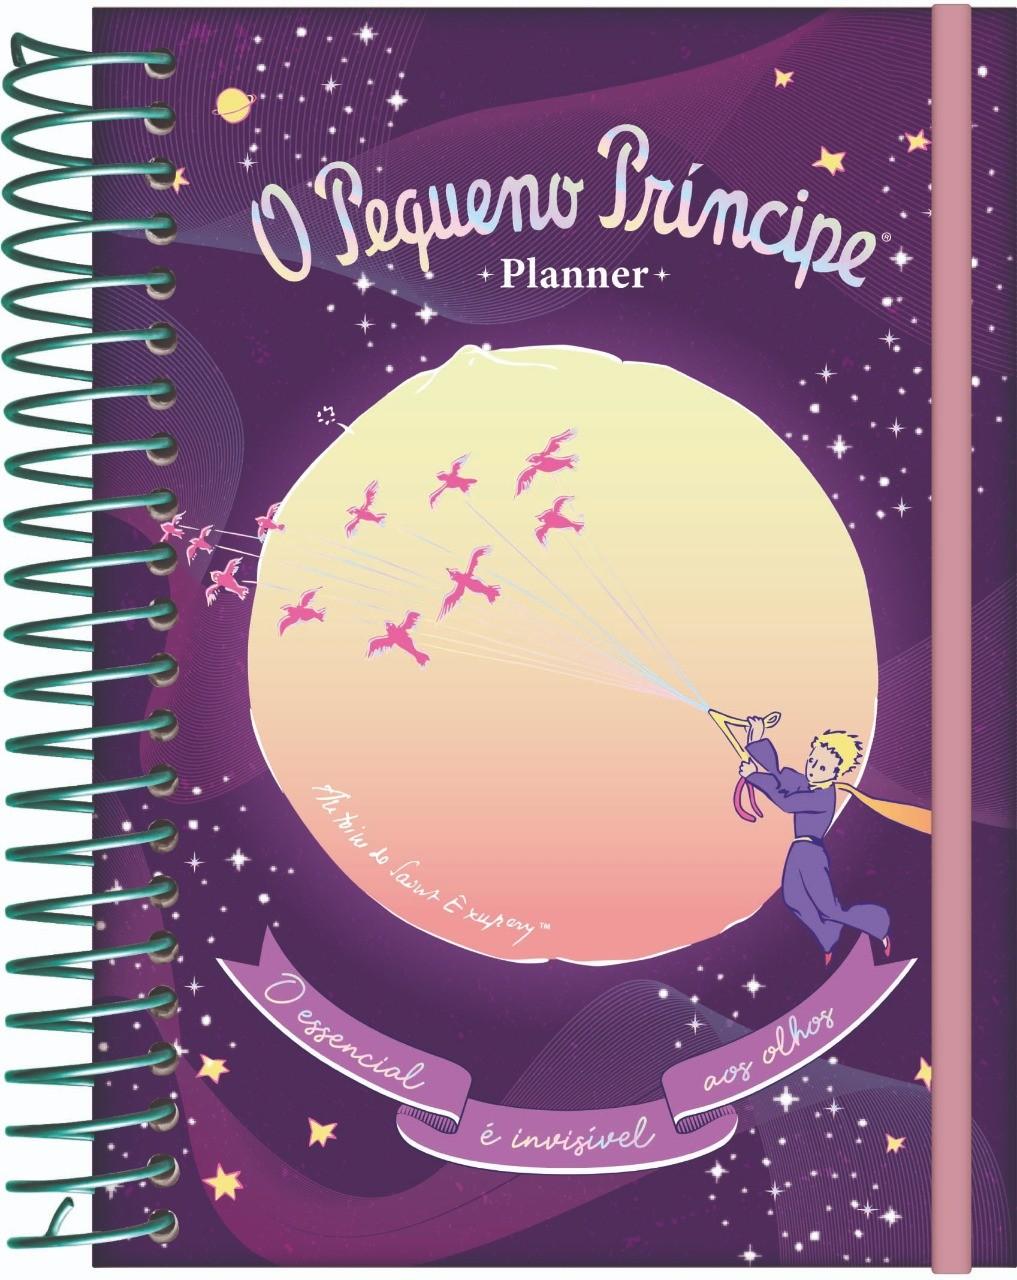 Planner Pequeno Príncipe - Jandaia